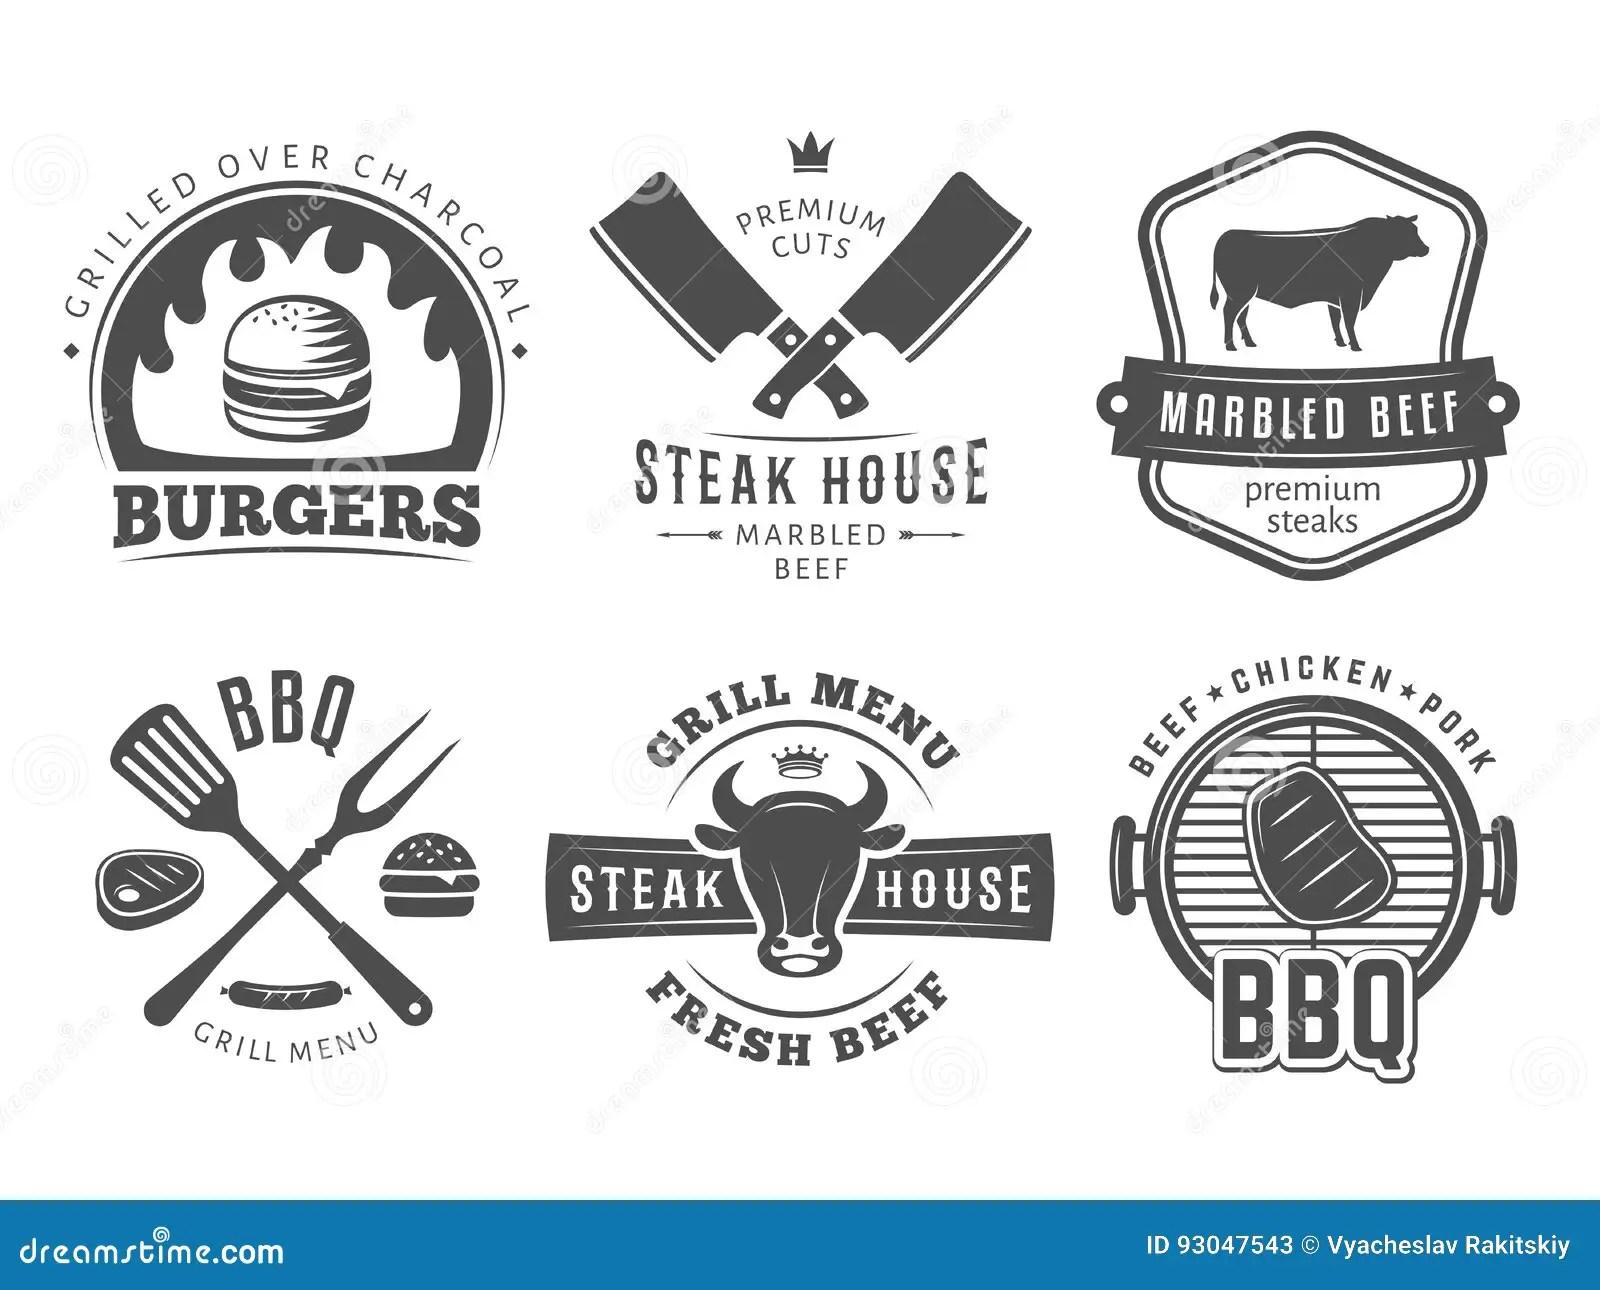 Bbq Burger Grill Badges Stock Vector Illustration Of